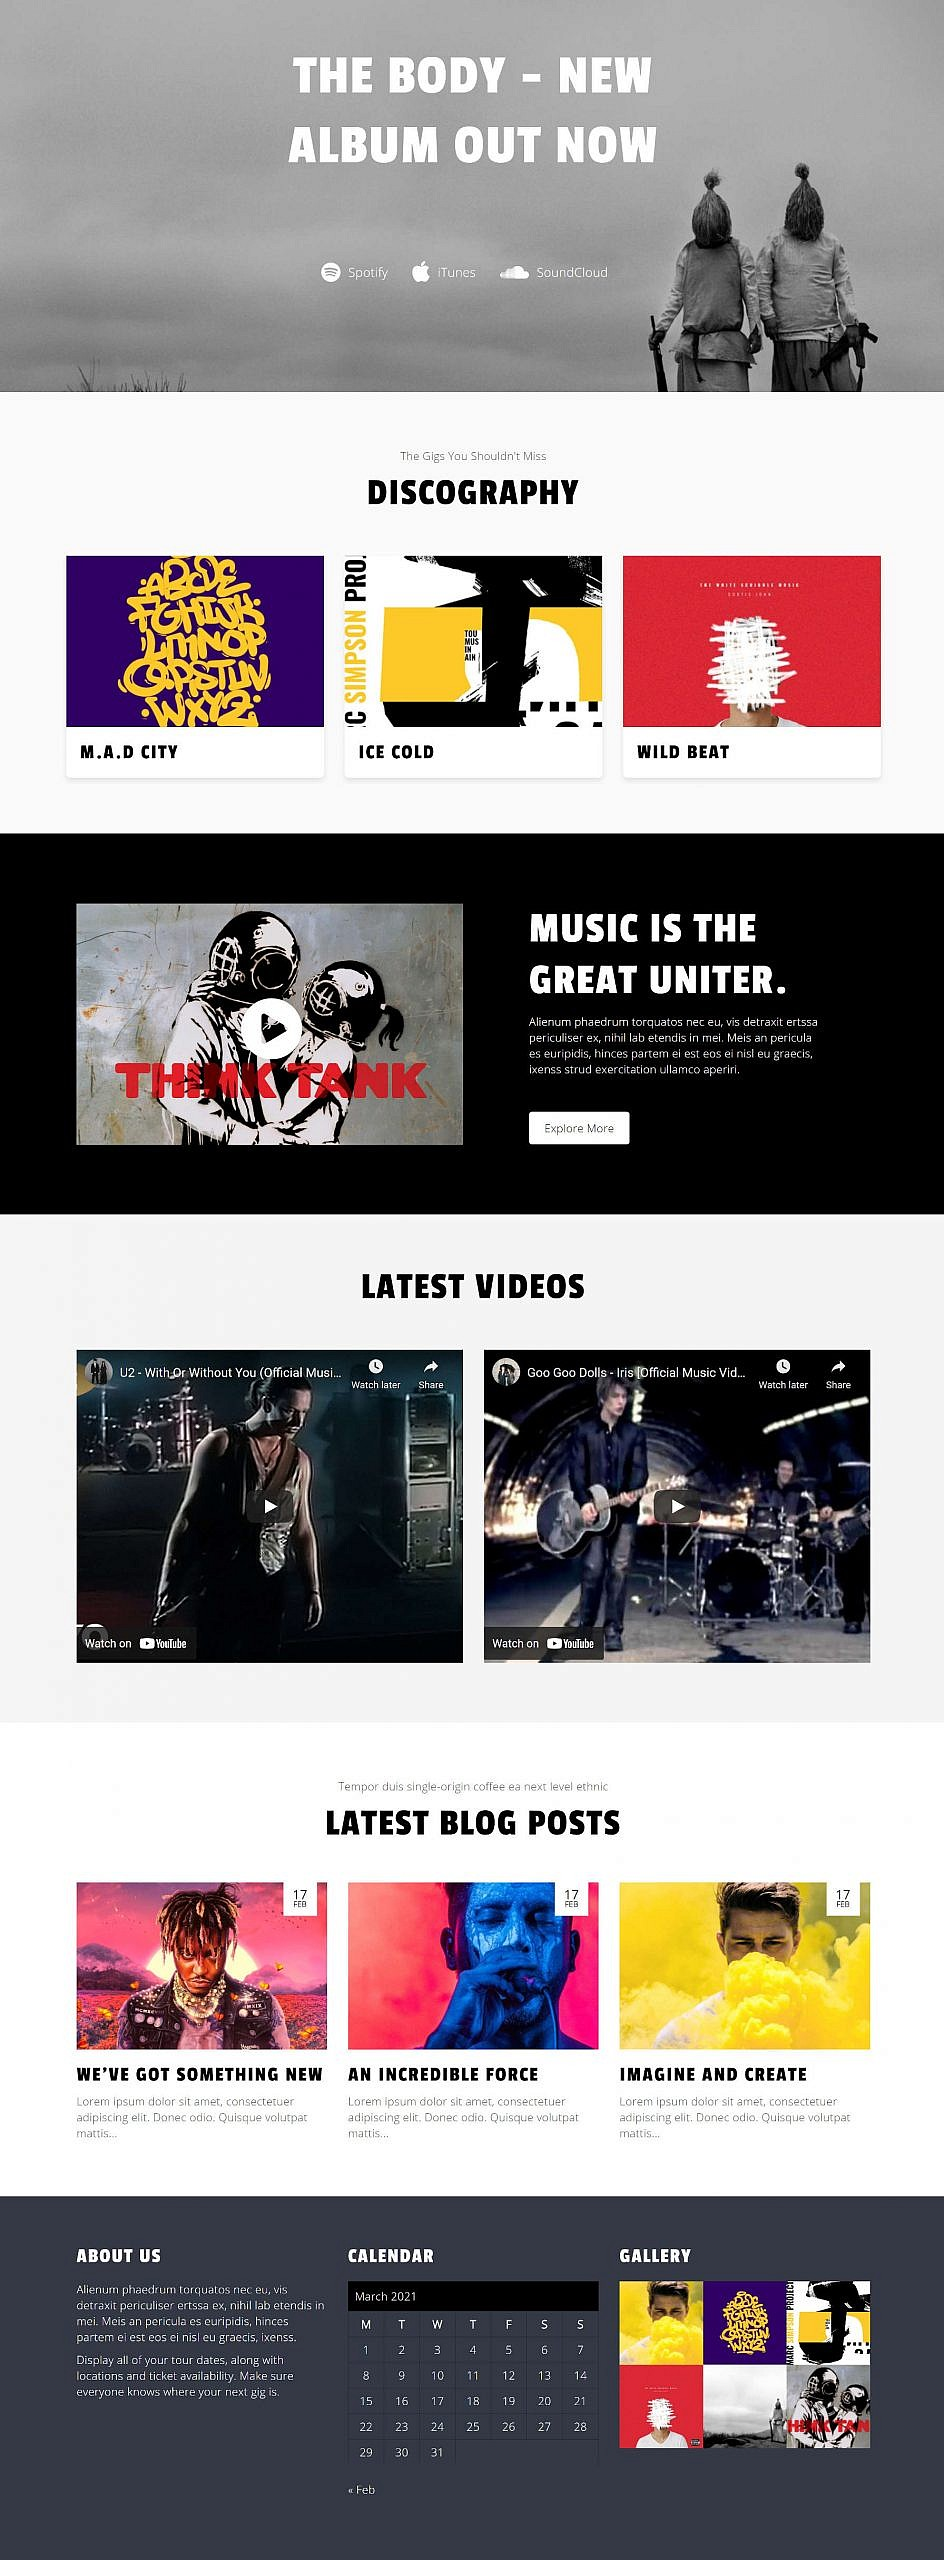 , Recreating the Music Artist WordPress Theme Homepage With the Block Editor – WordPress Tavern, Rojak WP